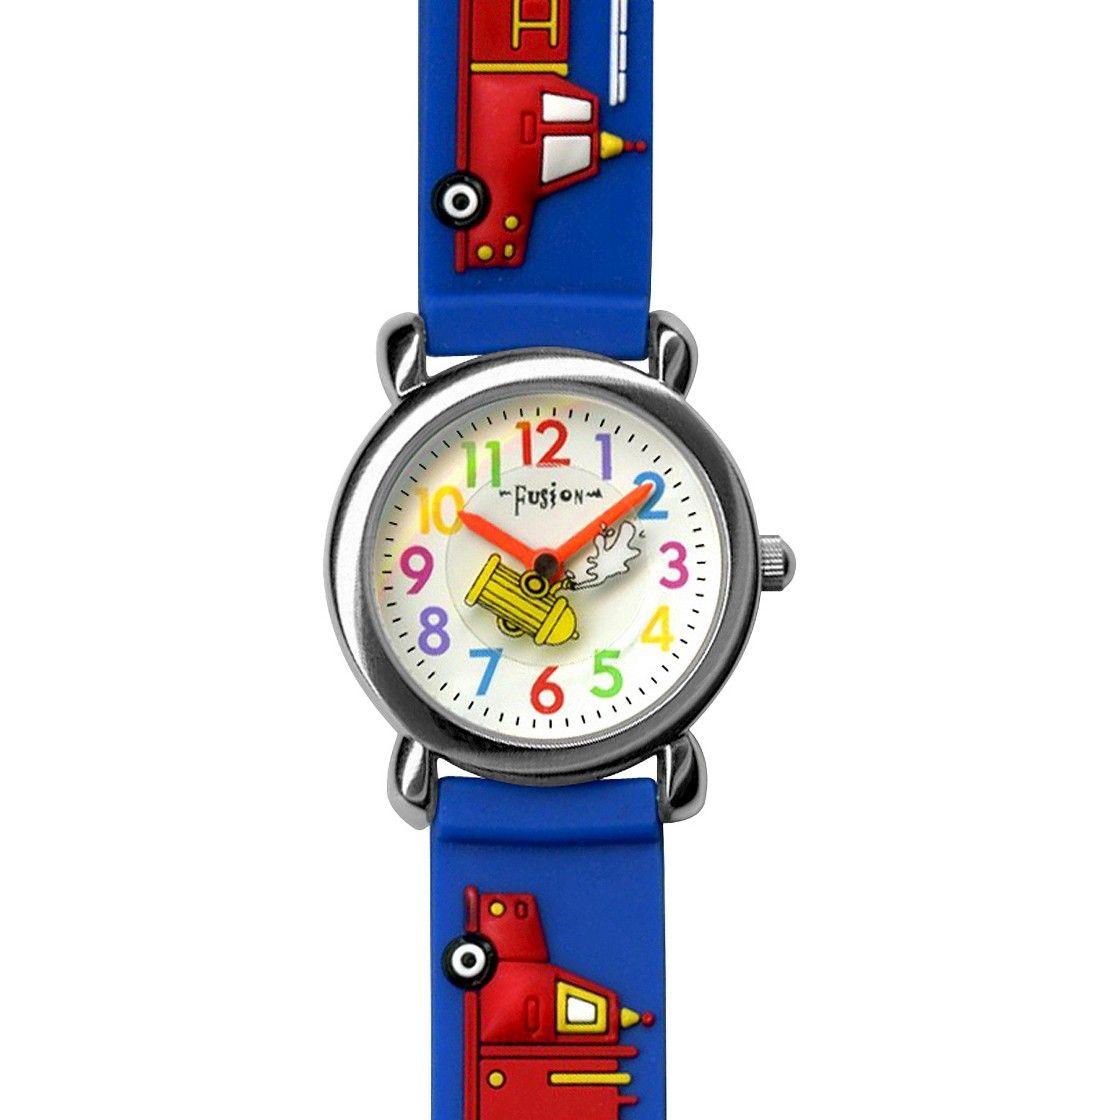 Boys' Fusion Firetruck Watch - Blue/Red